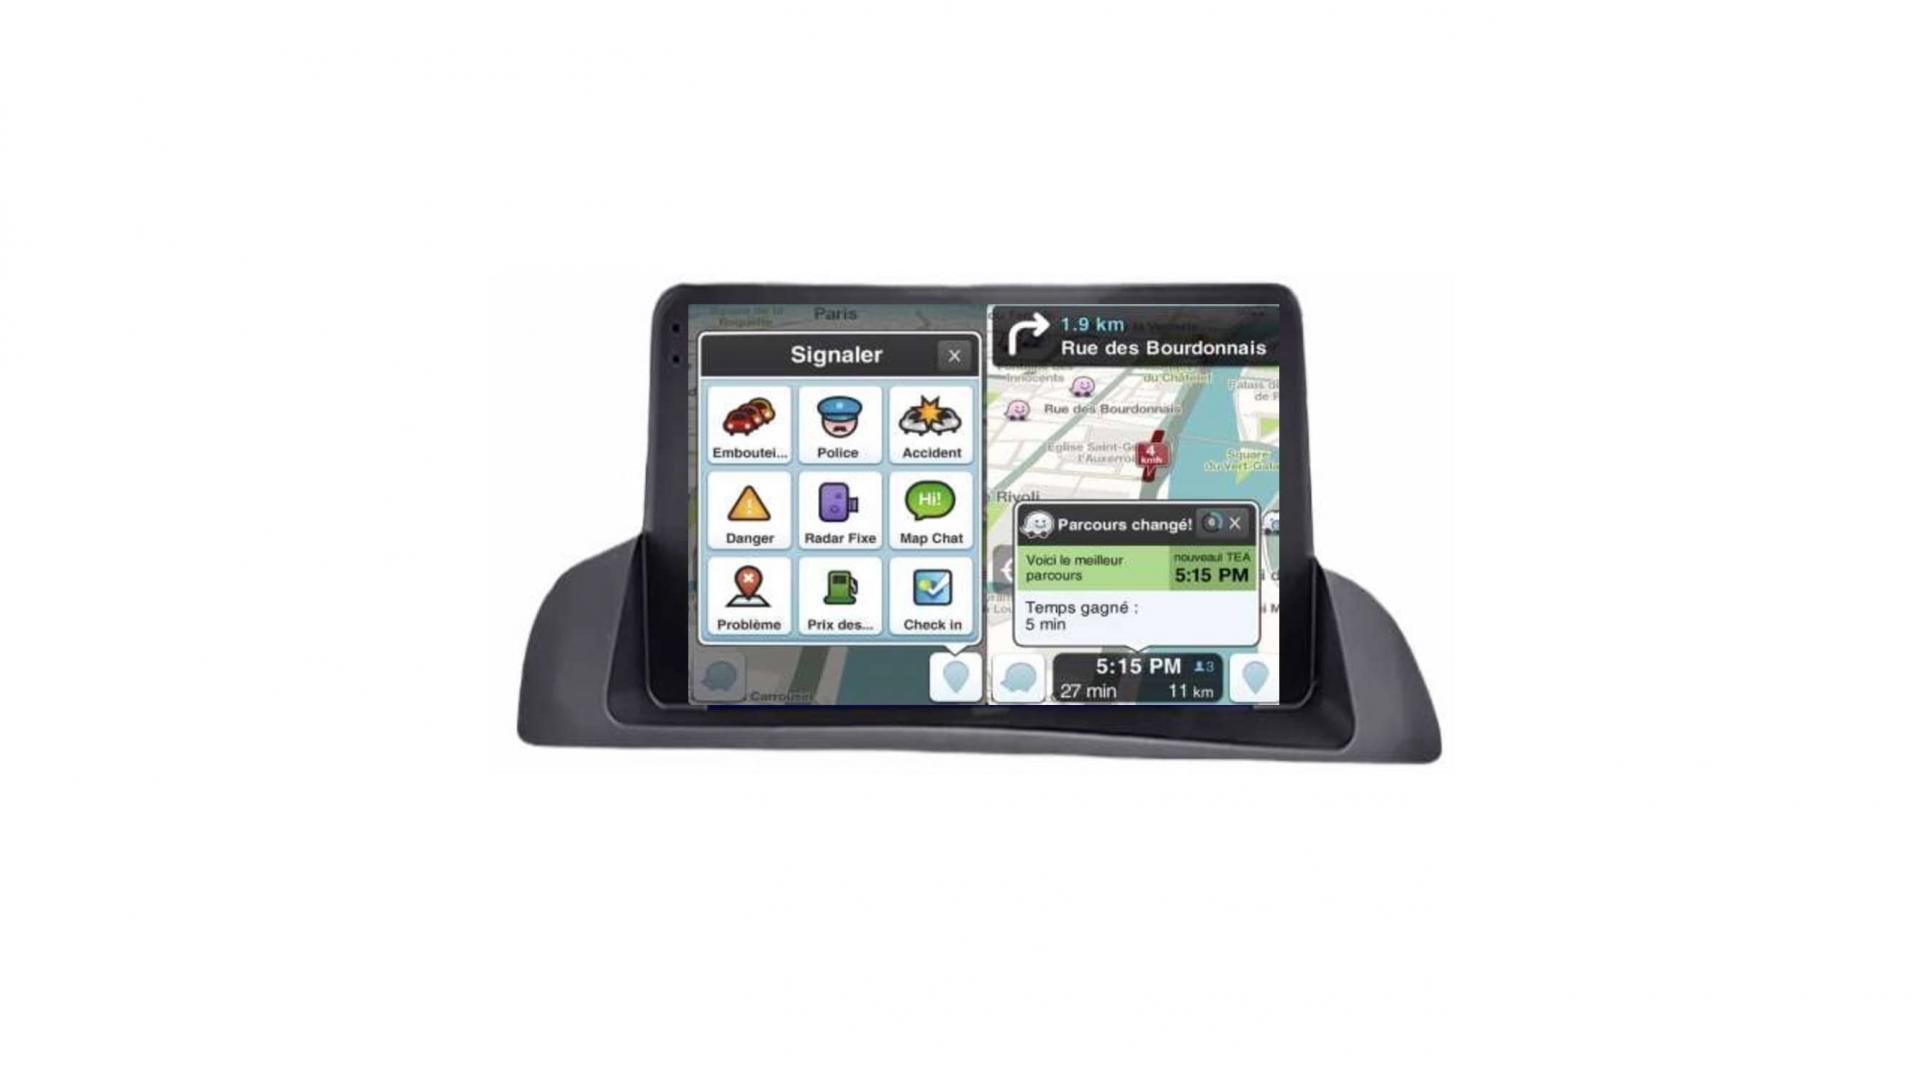 Lexus ct 200 autoradio gps bluetooth android auto carplay camera de recul commande au volant2